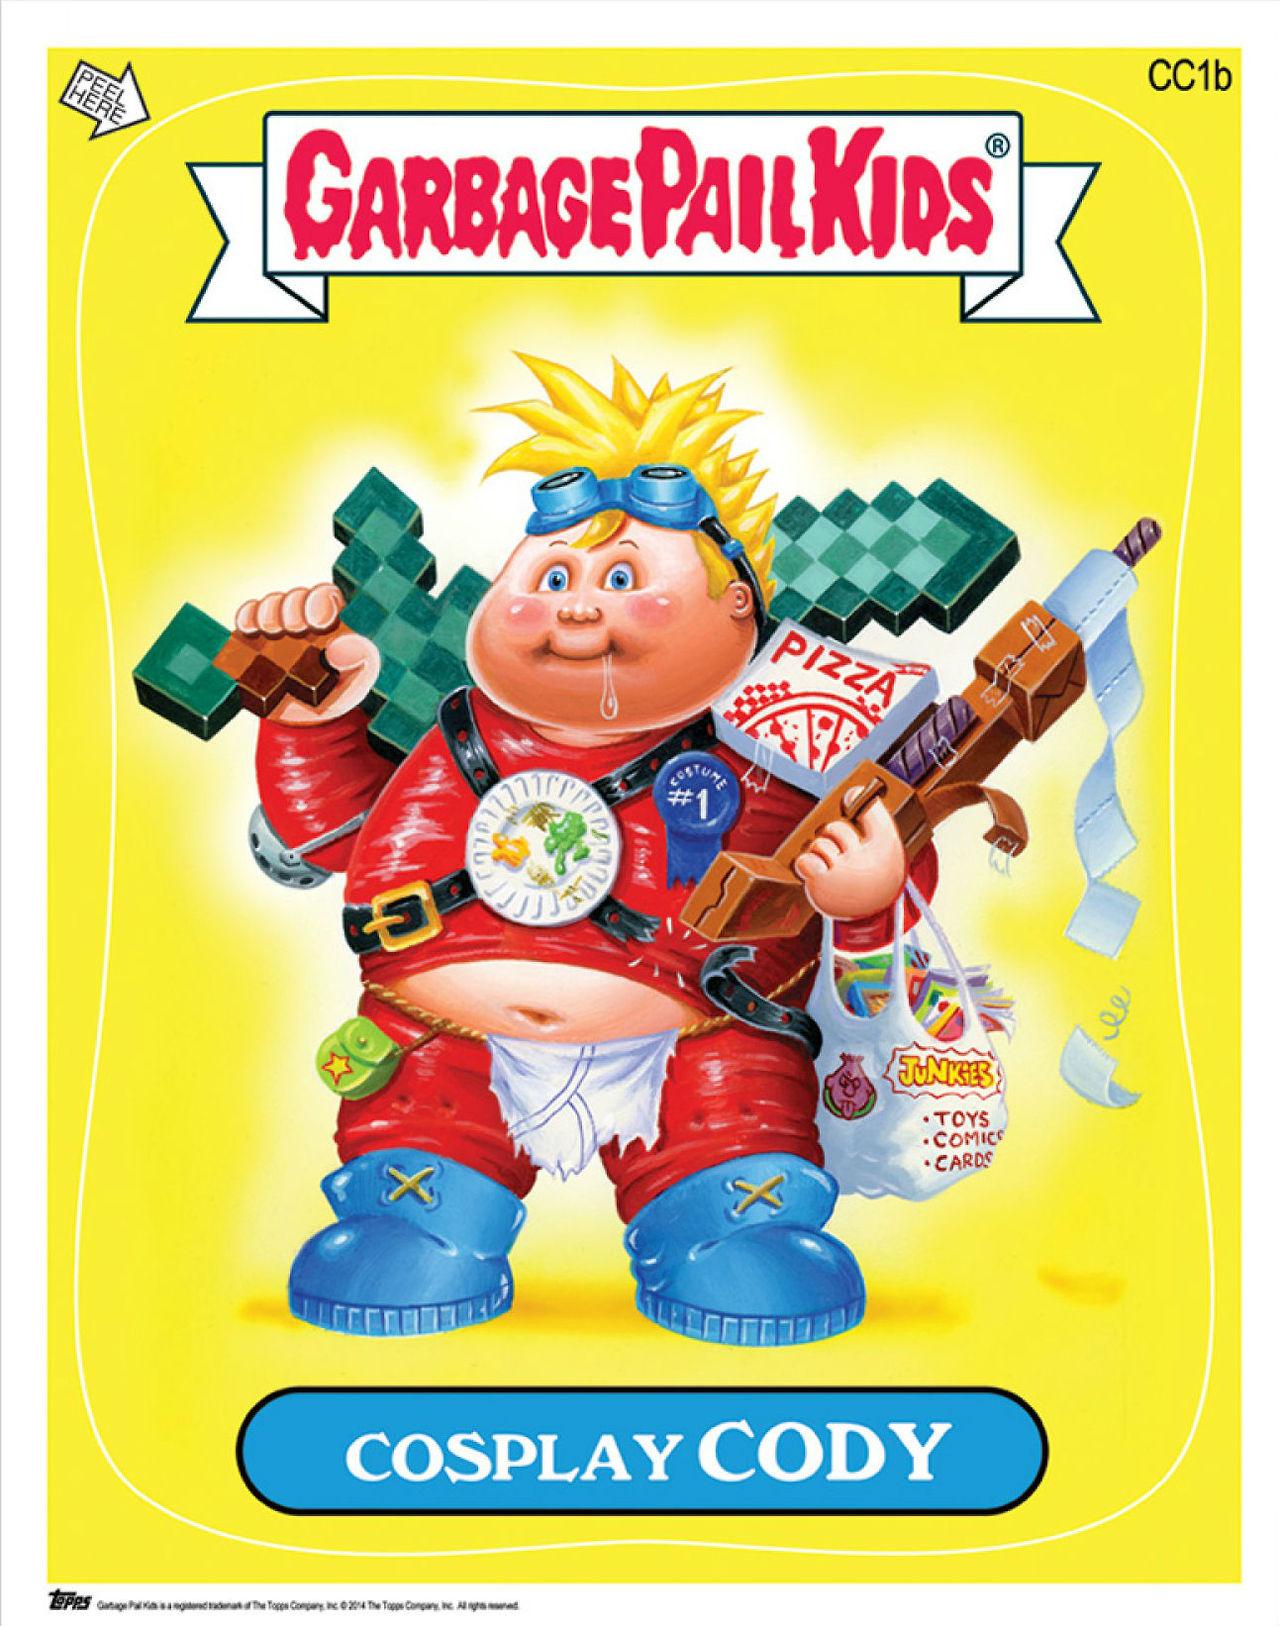 comic-con-exclusive-garbage-pail-kids-card-set2